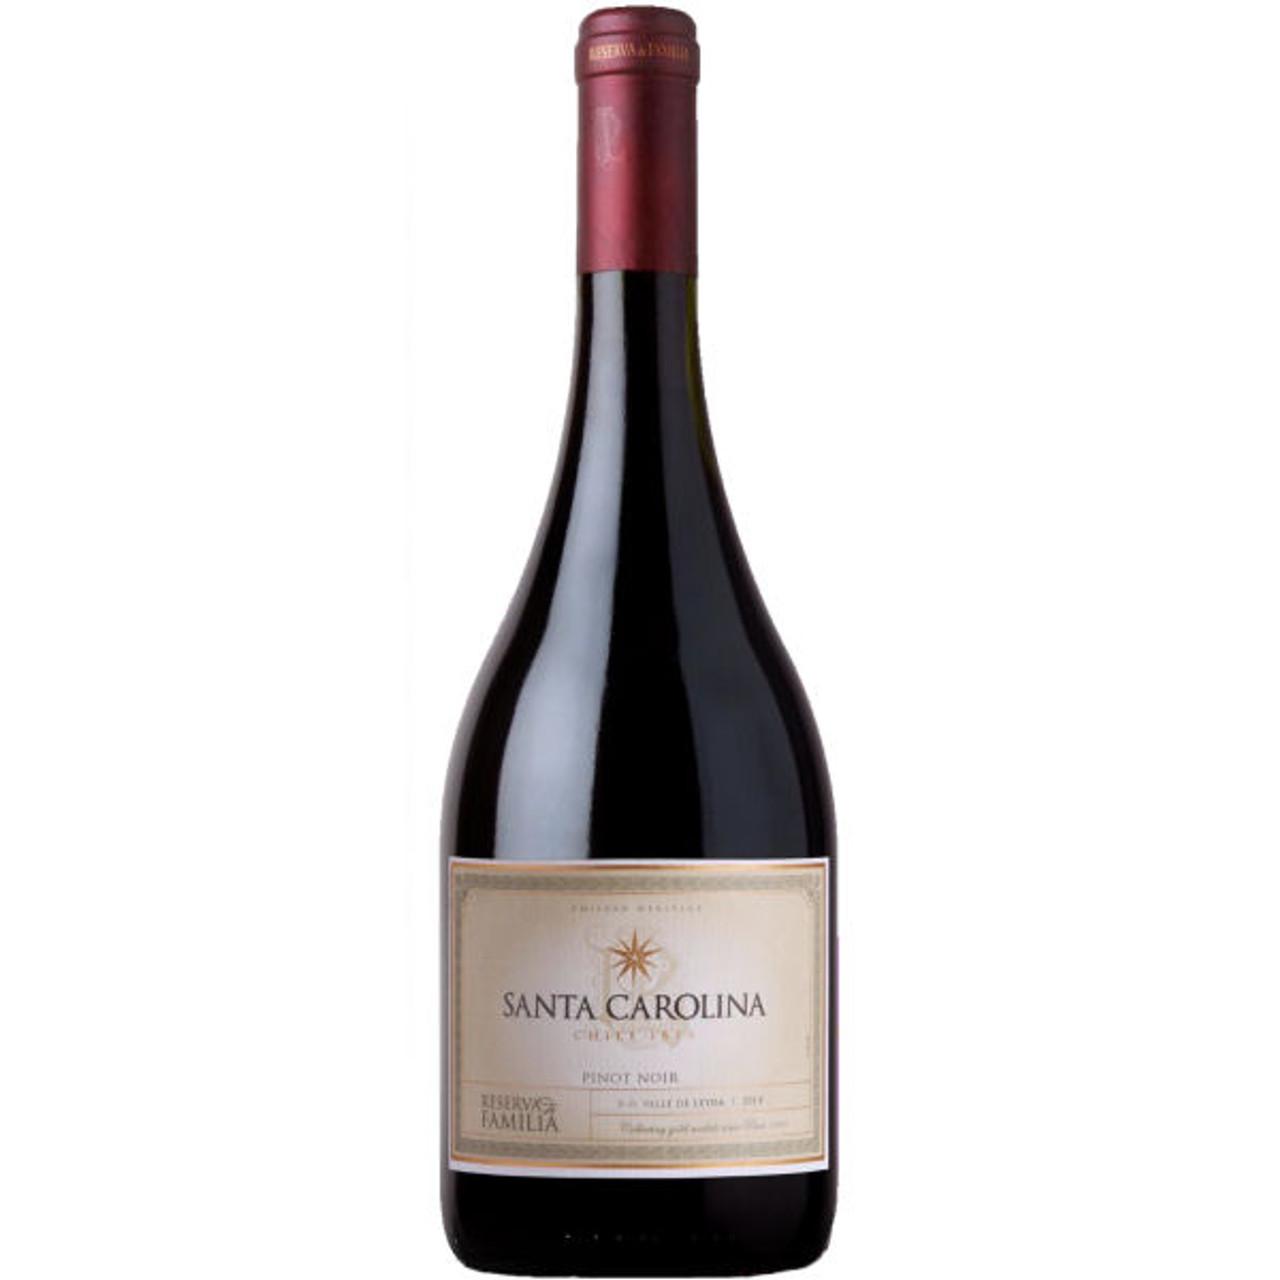 Santa Carolina Reserva de Familia Pinot Noir